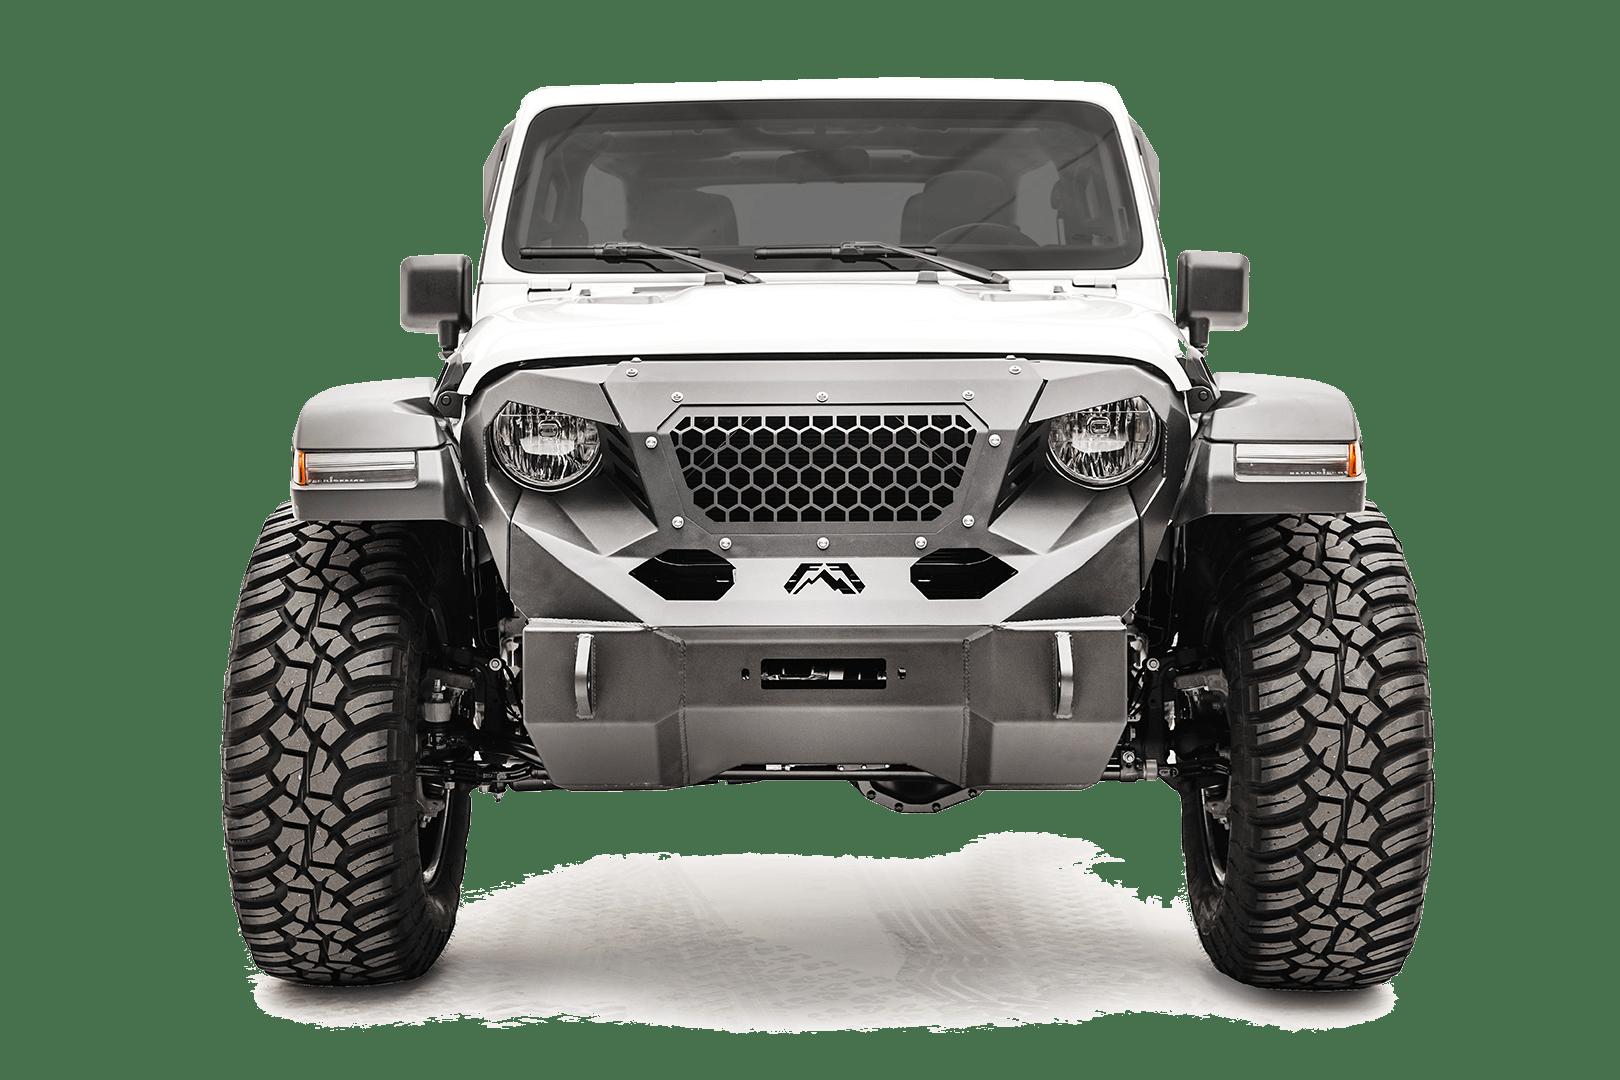 Fabfours Jeep Gladiator Grumper front bumper.